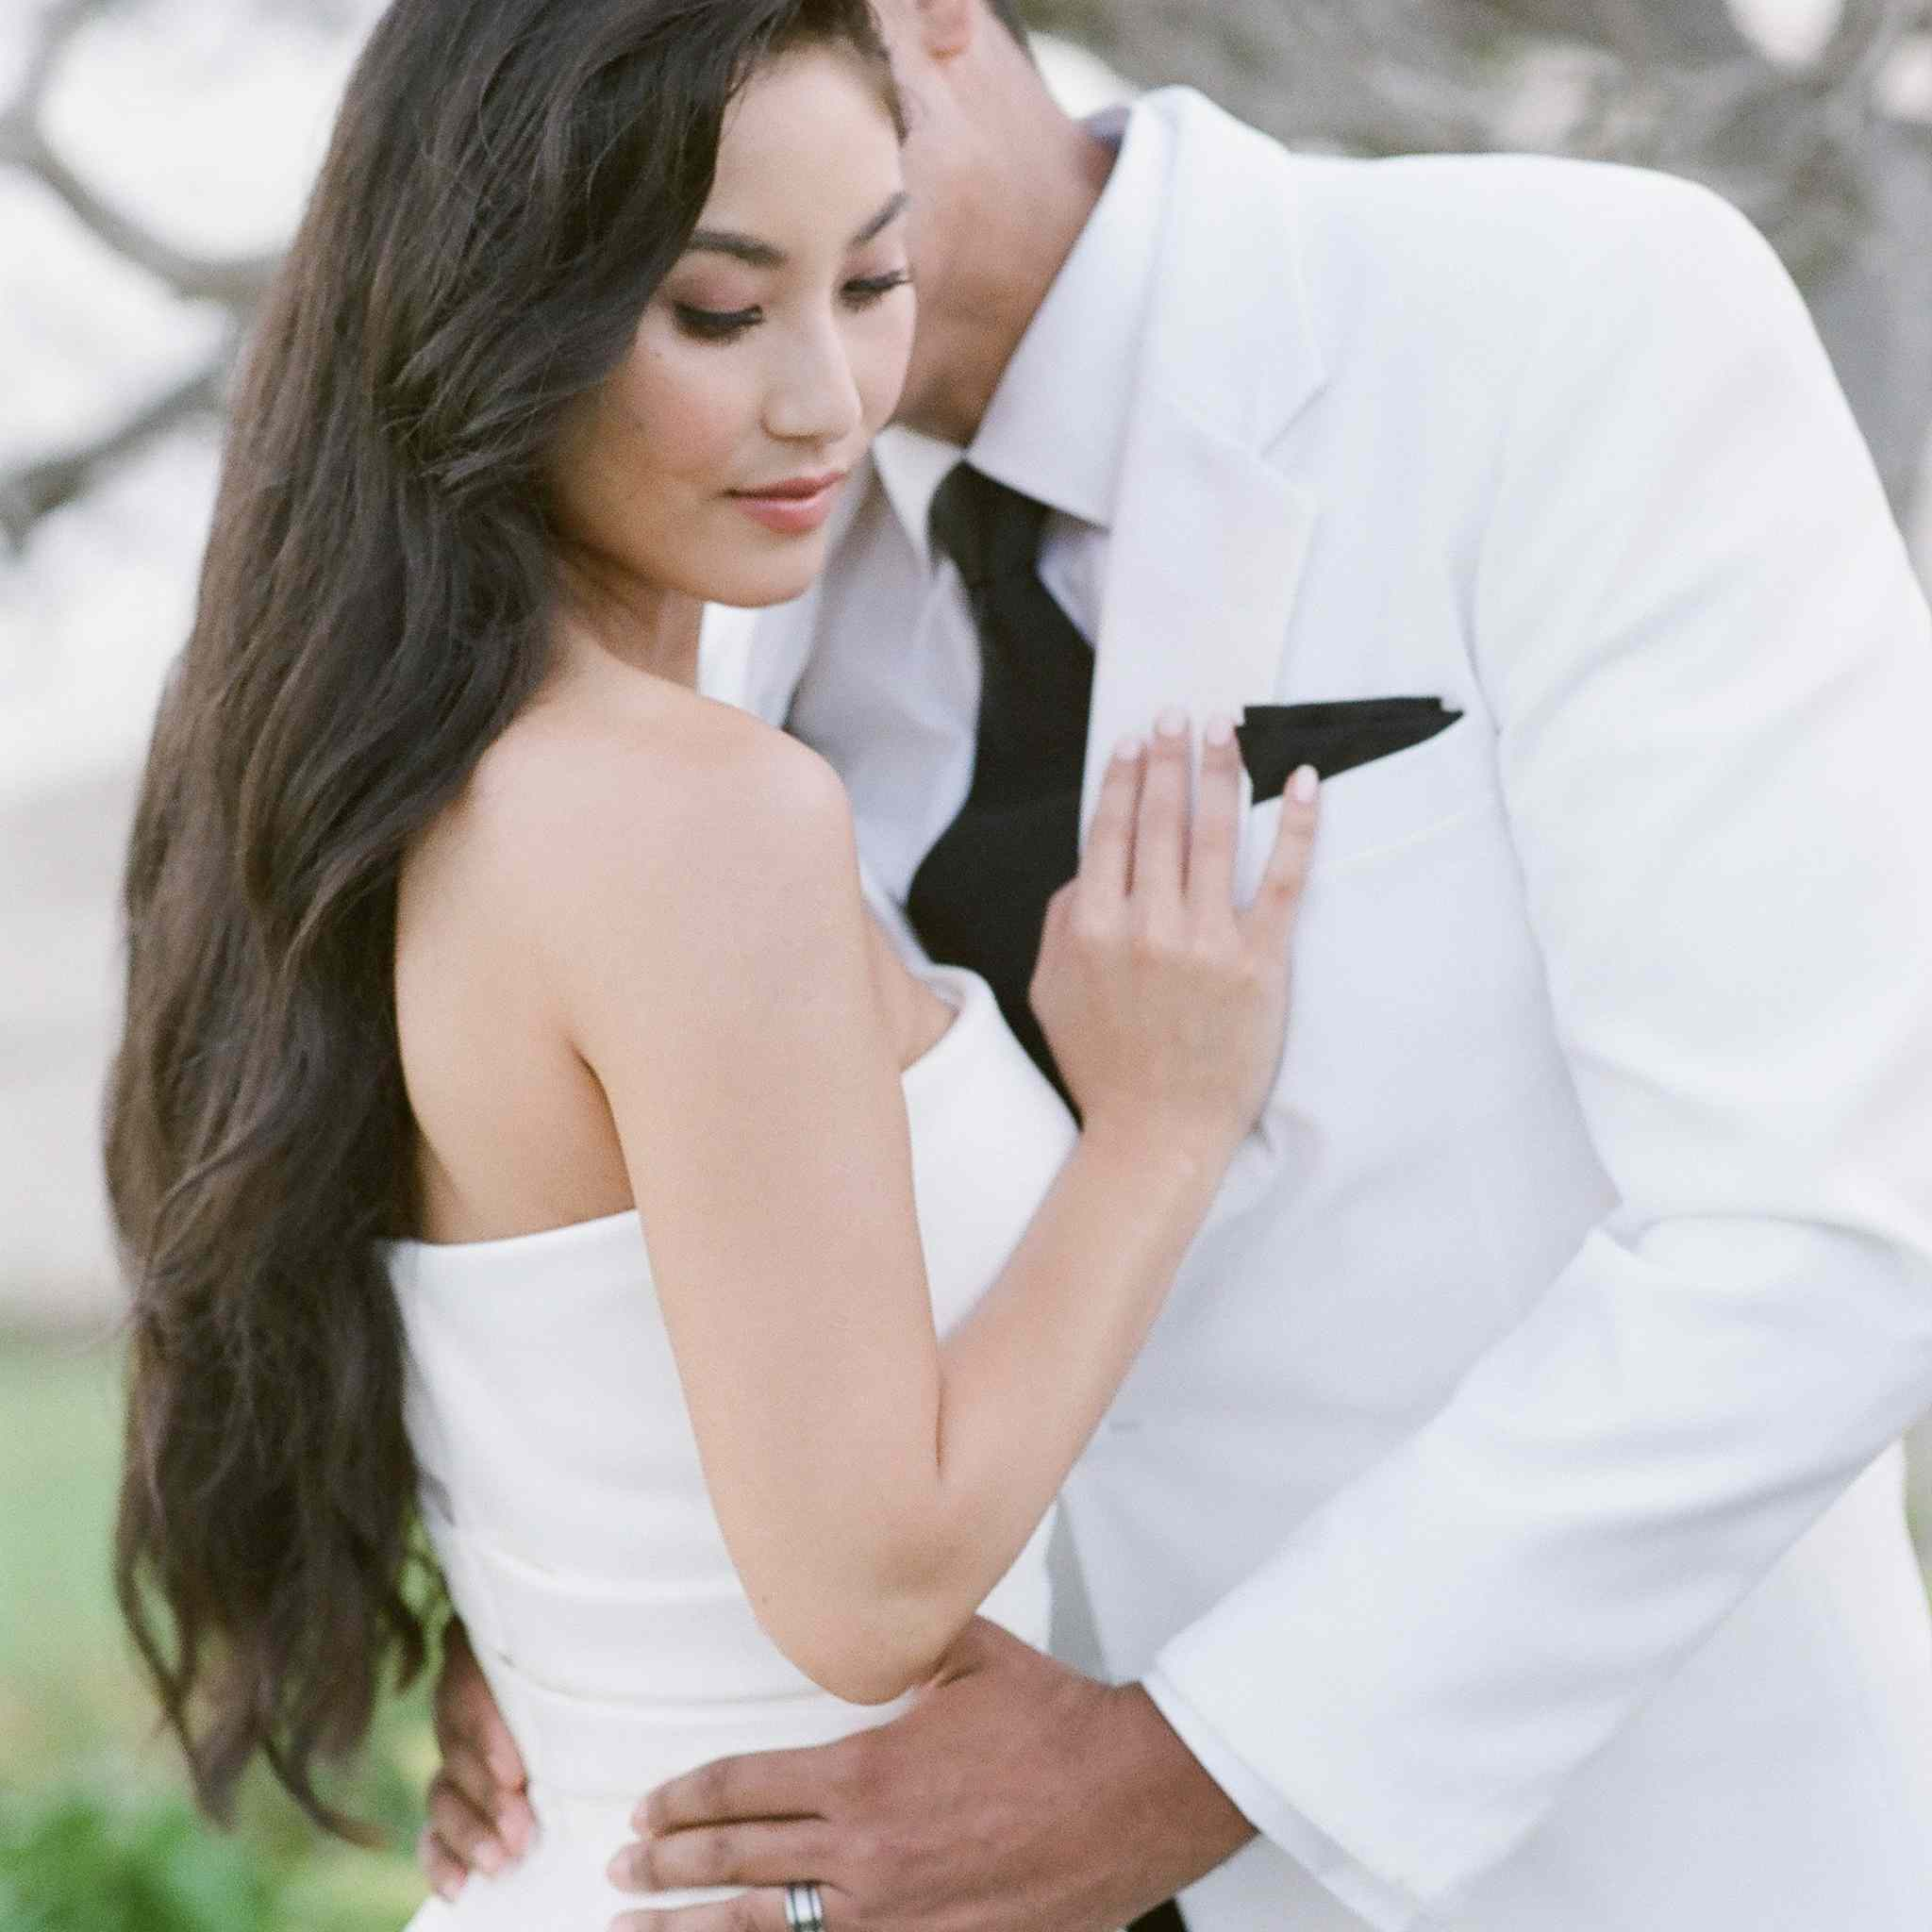 Groom kissing bride with long hair